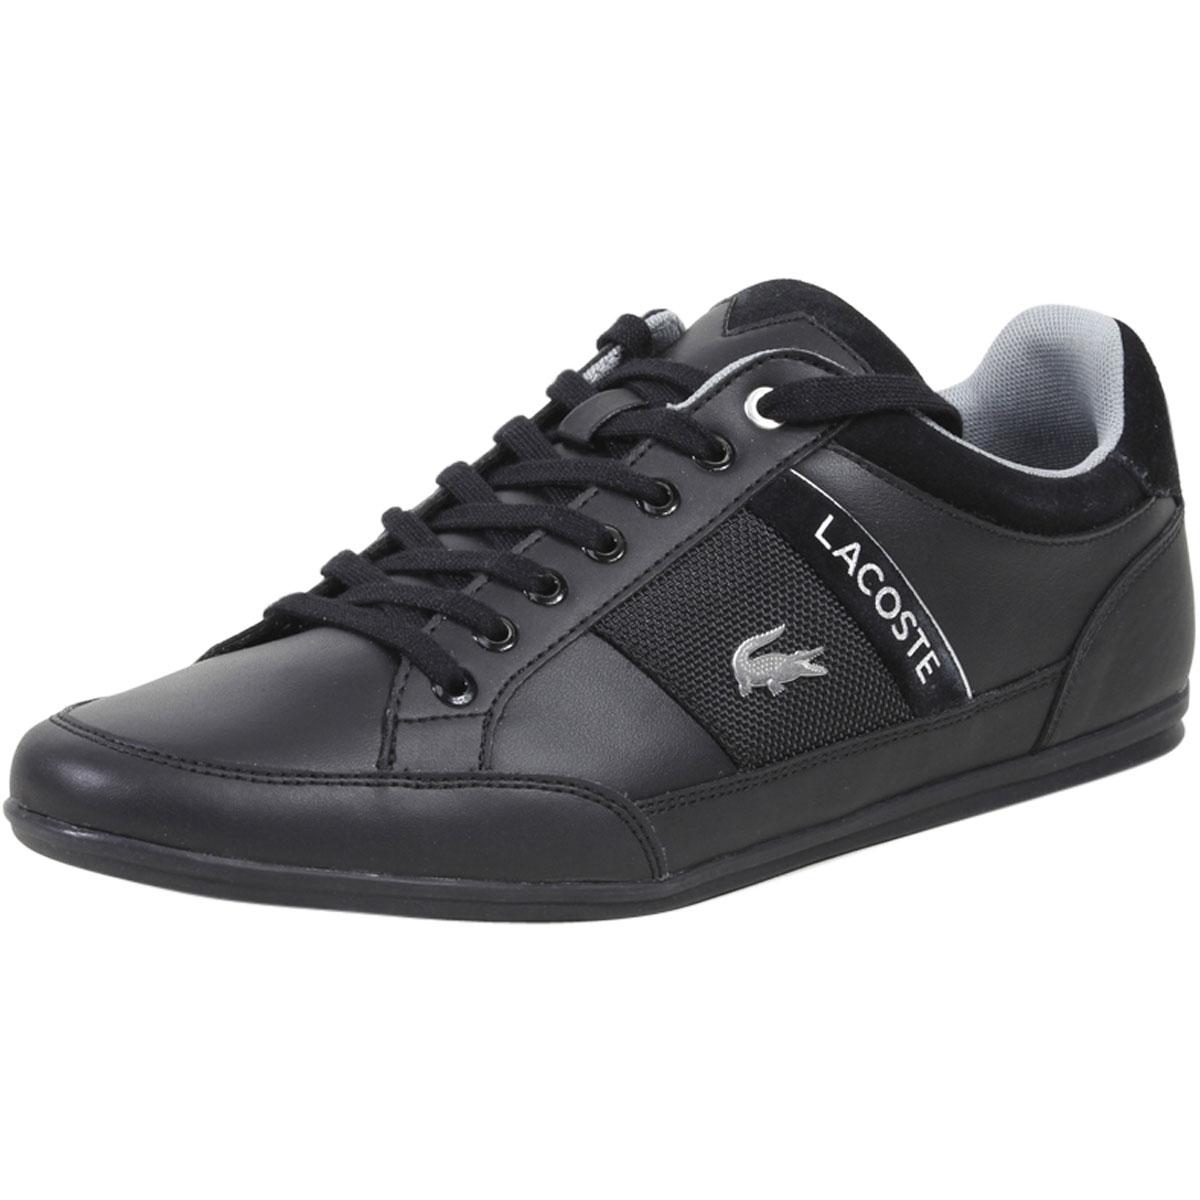 Lacoste Men's Chaymon-118 Sneakers Shoes